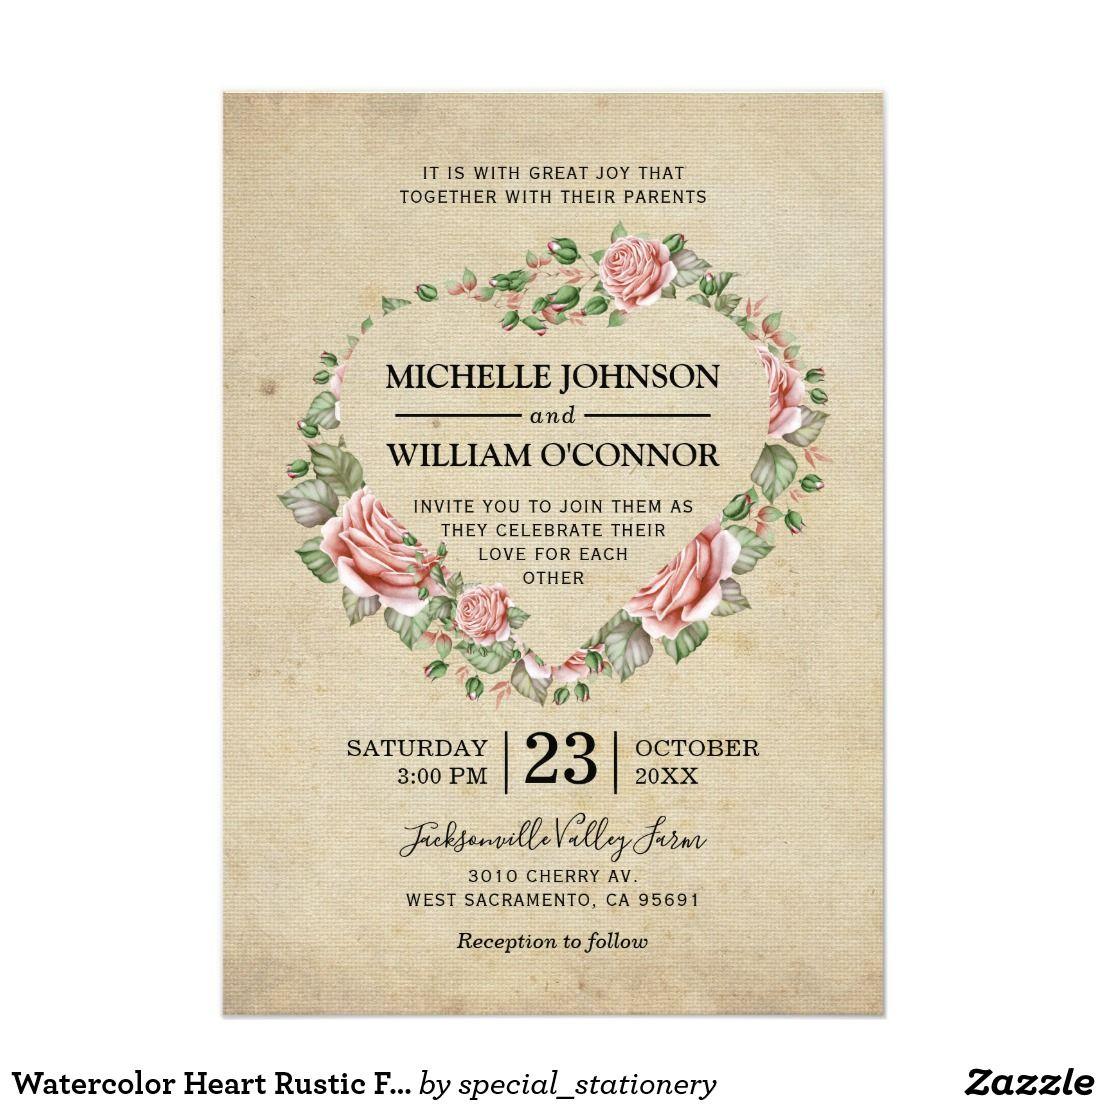 Watercolor Heart Rustic Floral Vintage Wedding Card Rustic rose ...